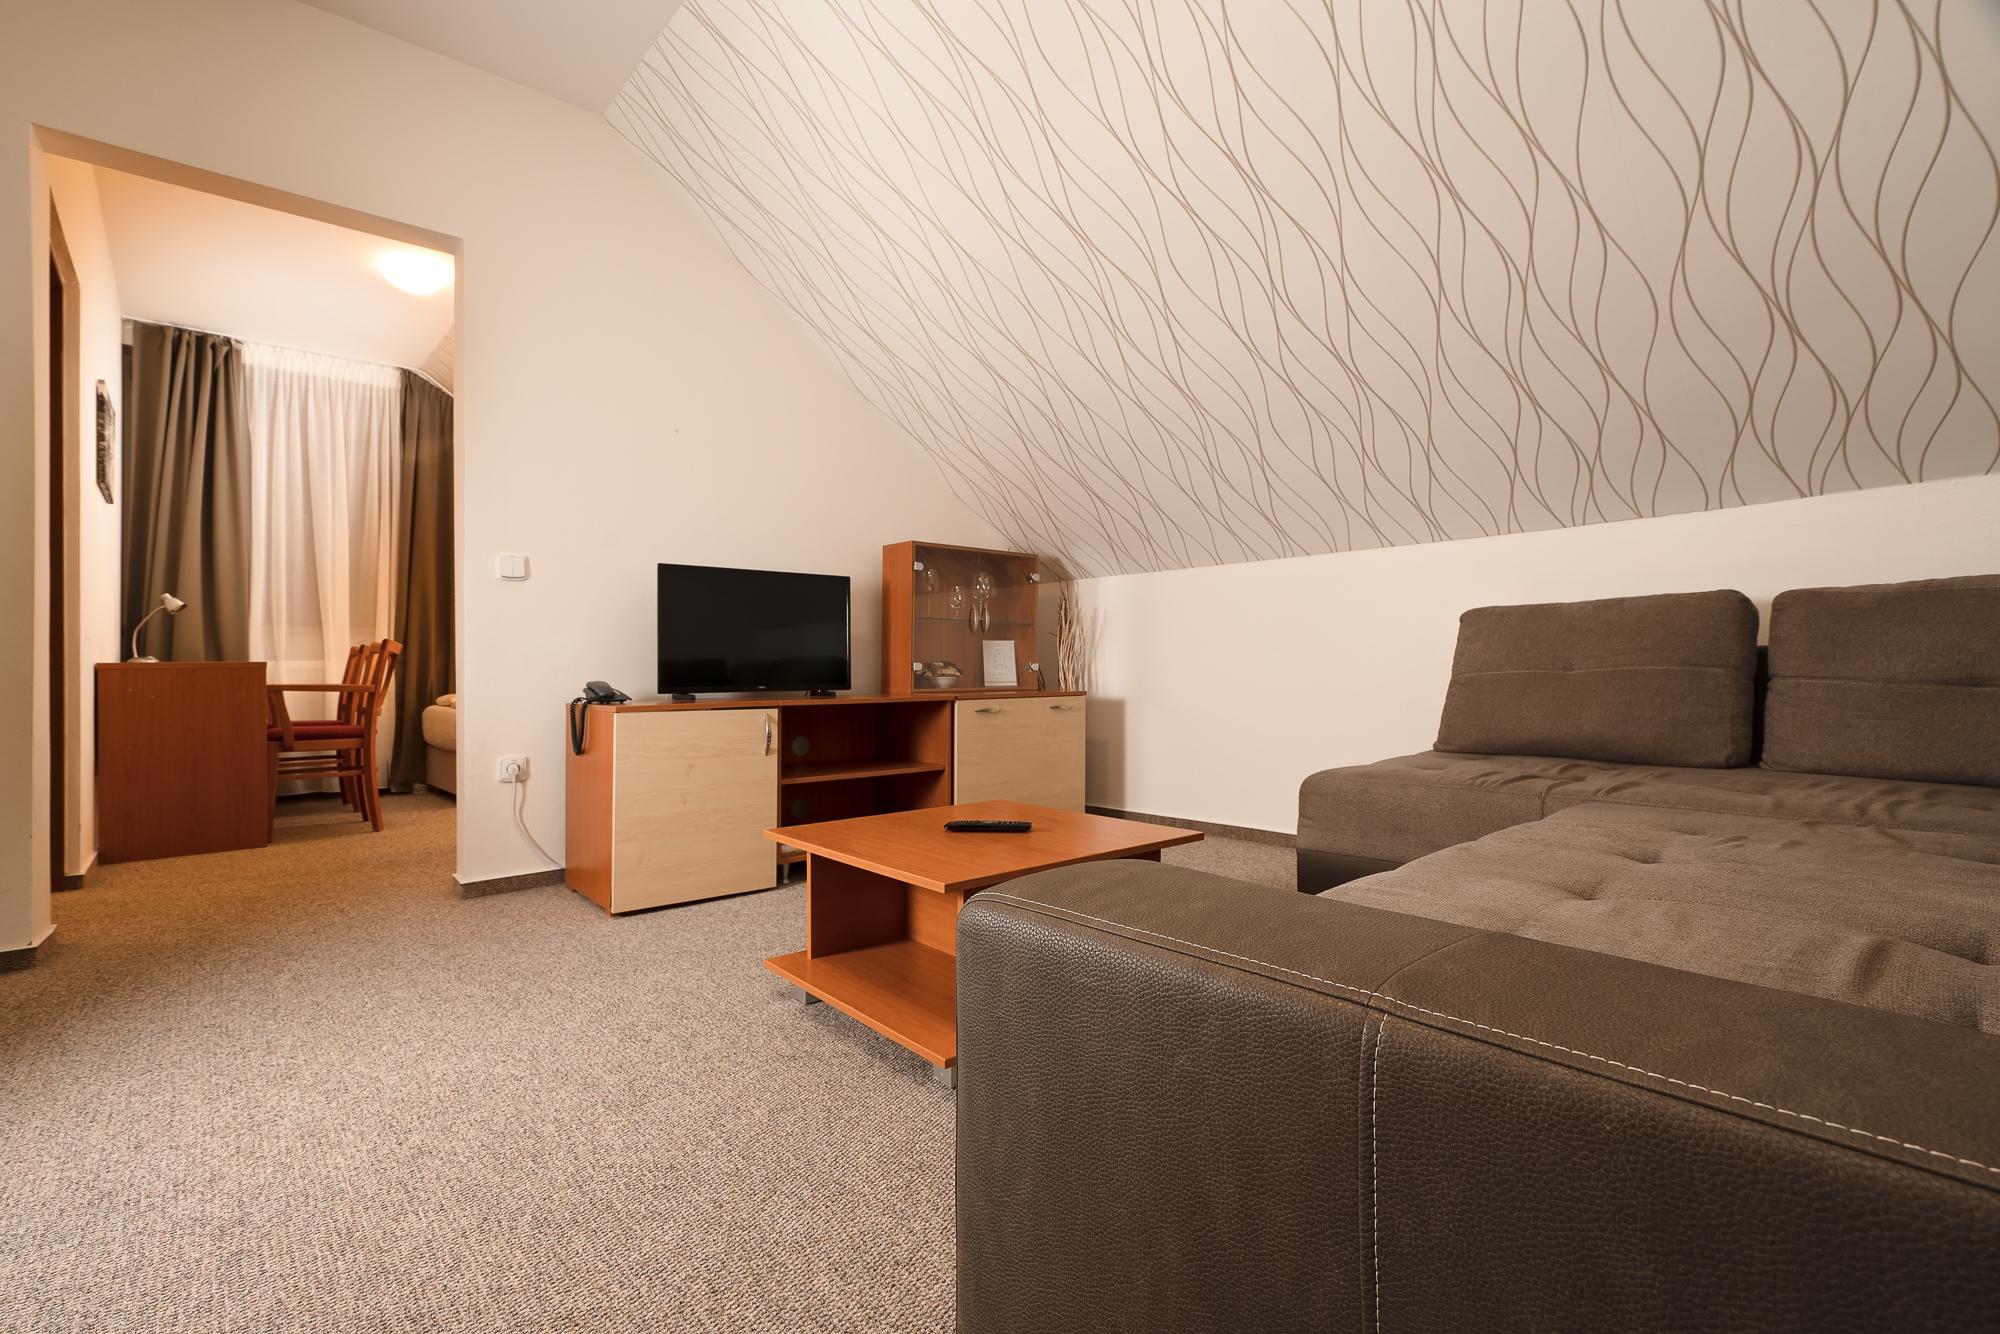 https://cms.satur.sk/data/imgs/tour_image/orig/hotel_termal_vyhne-37-1802507.jpg